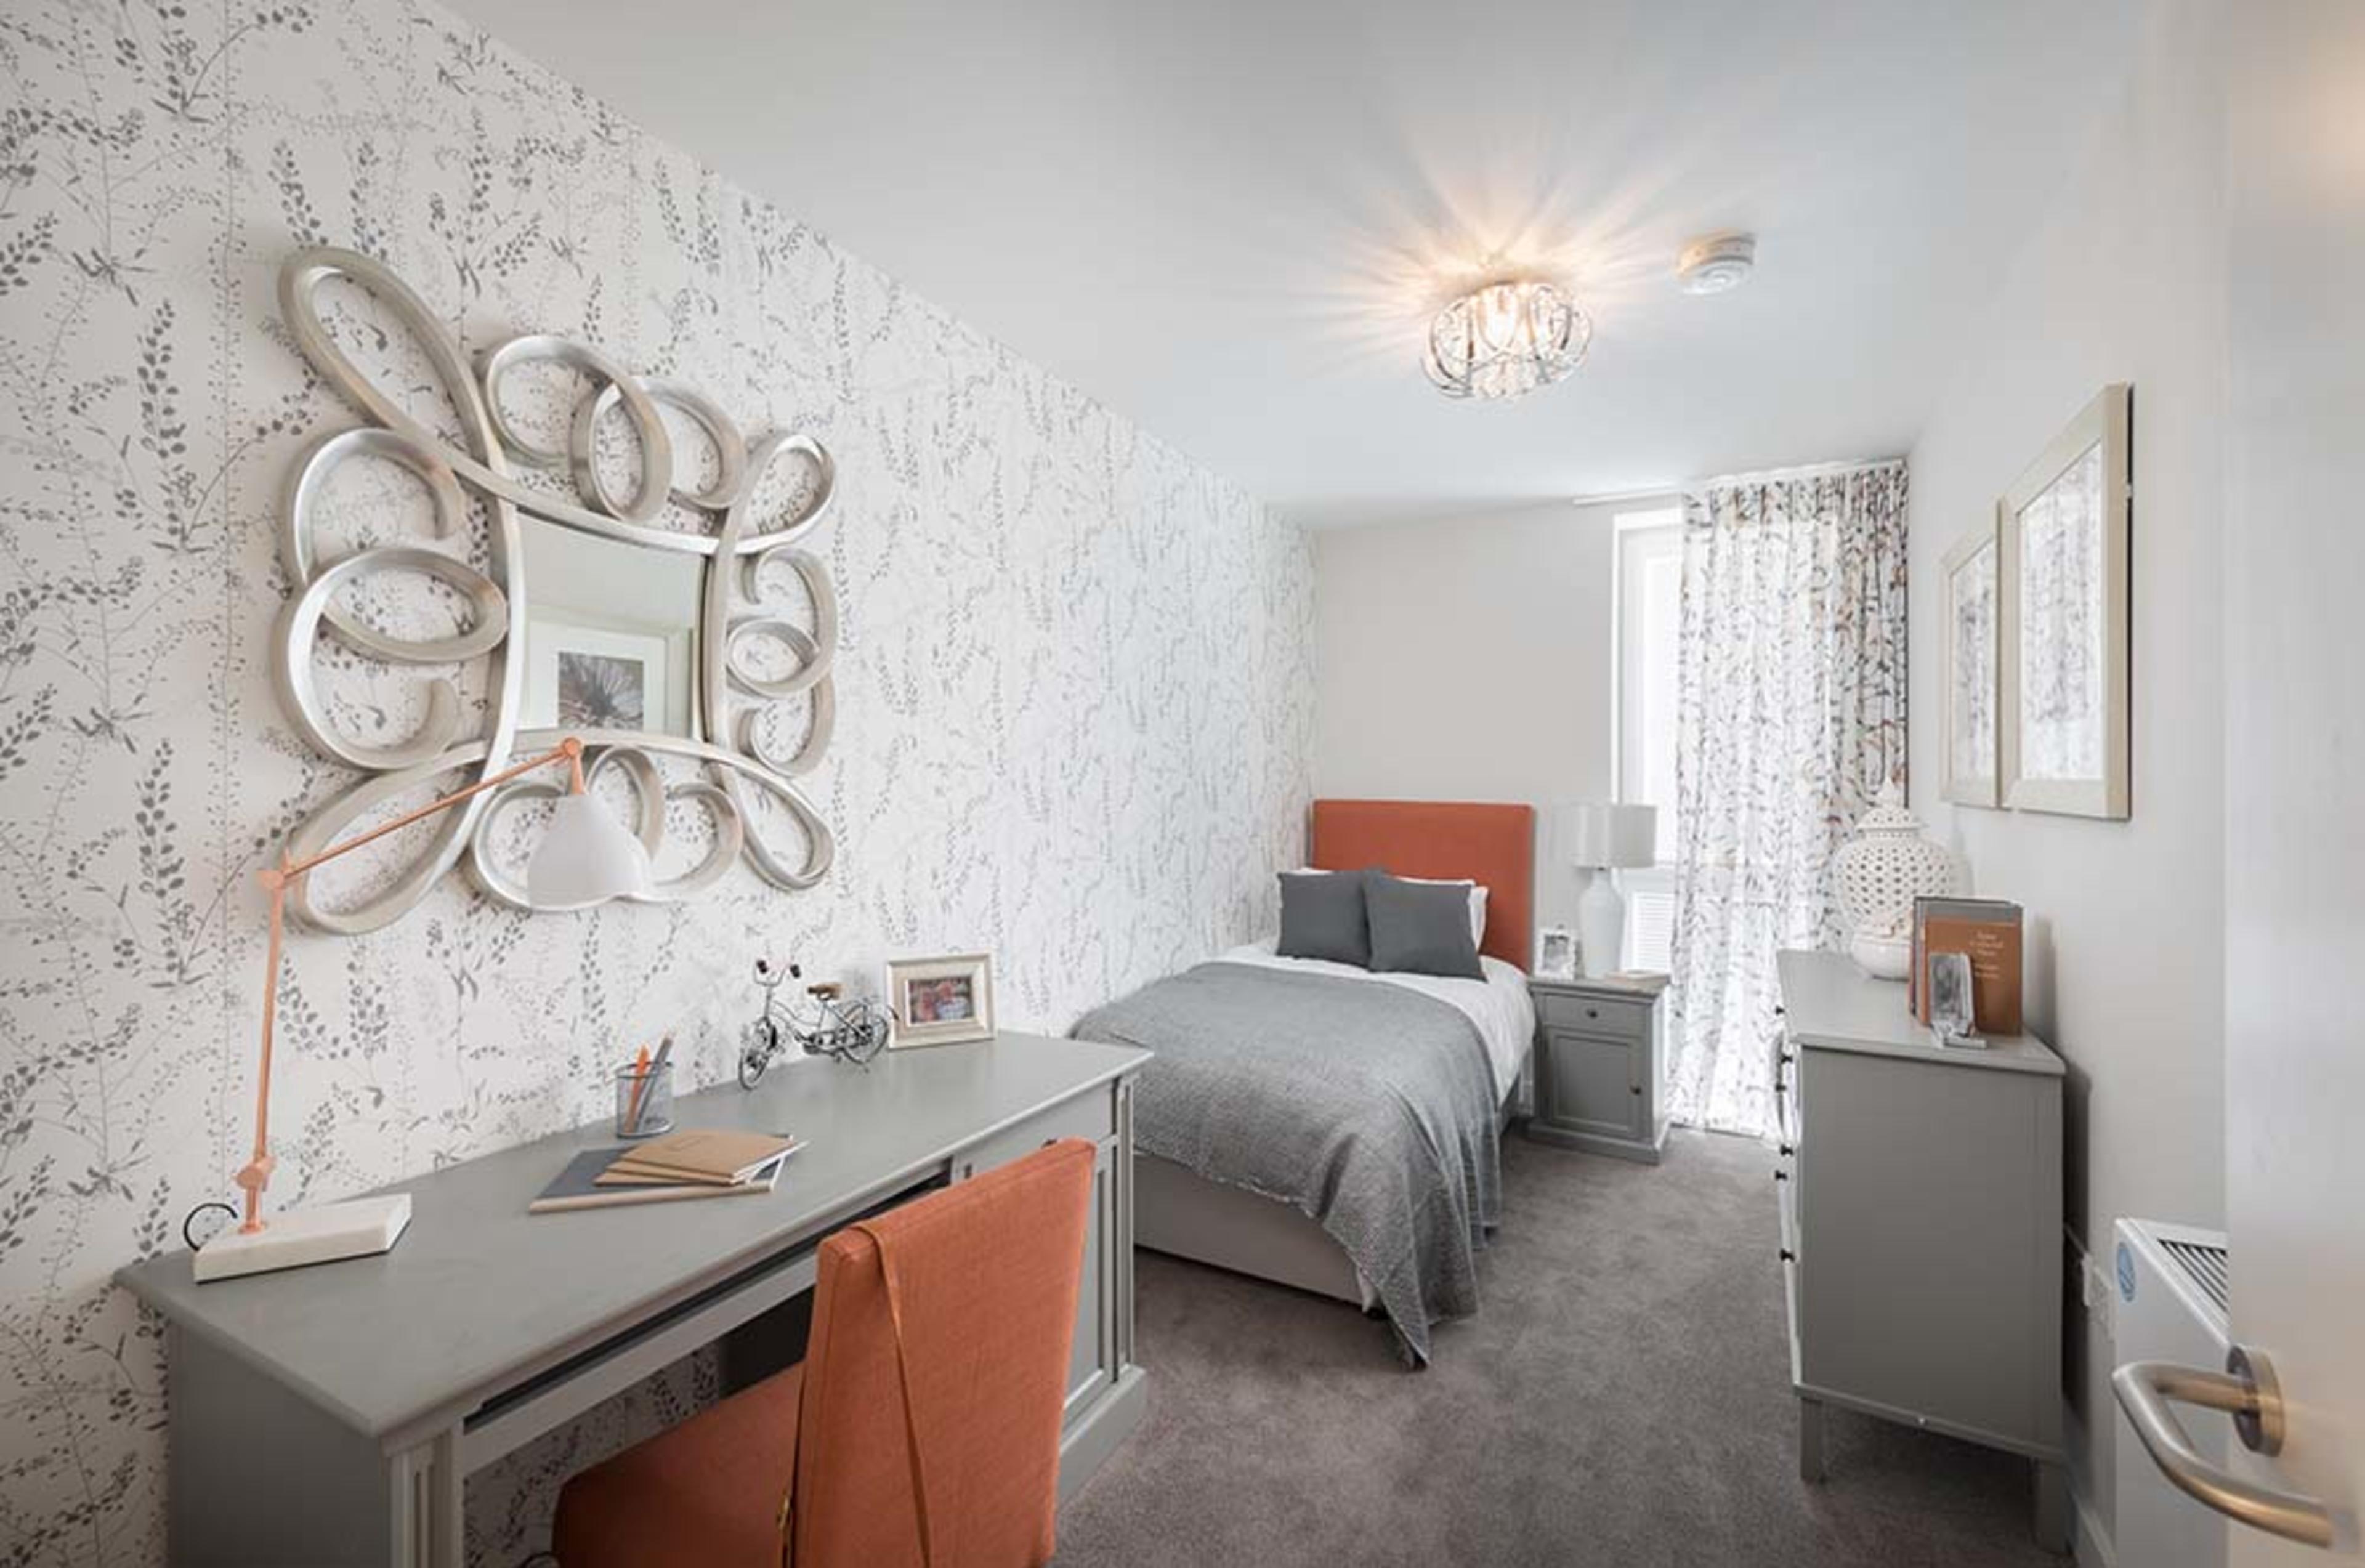 Huntley Place - Single bedroom